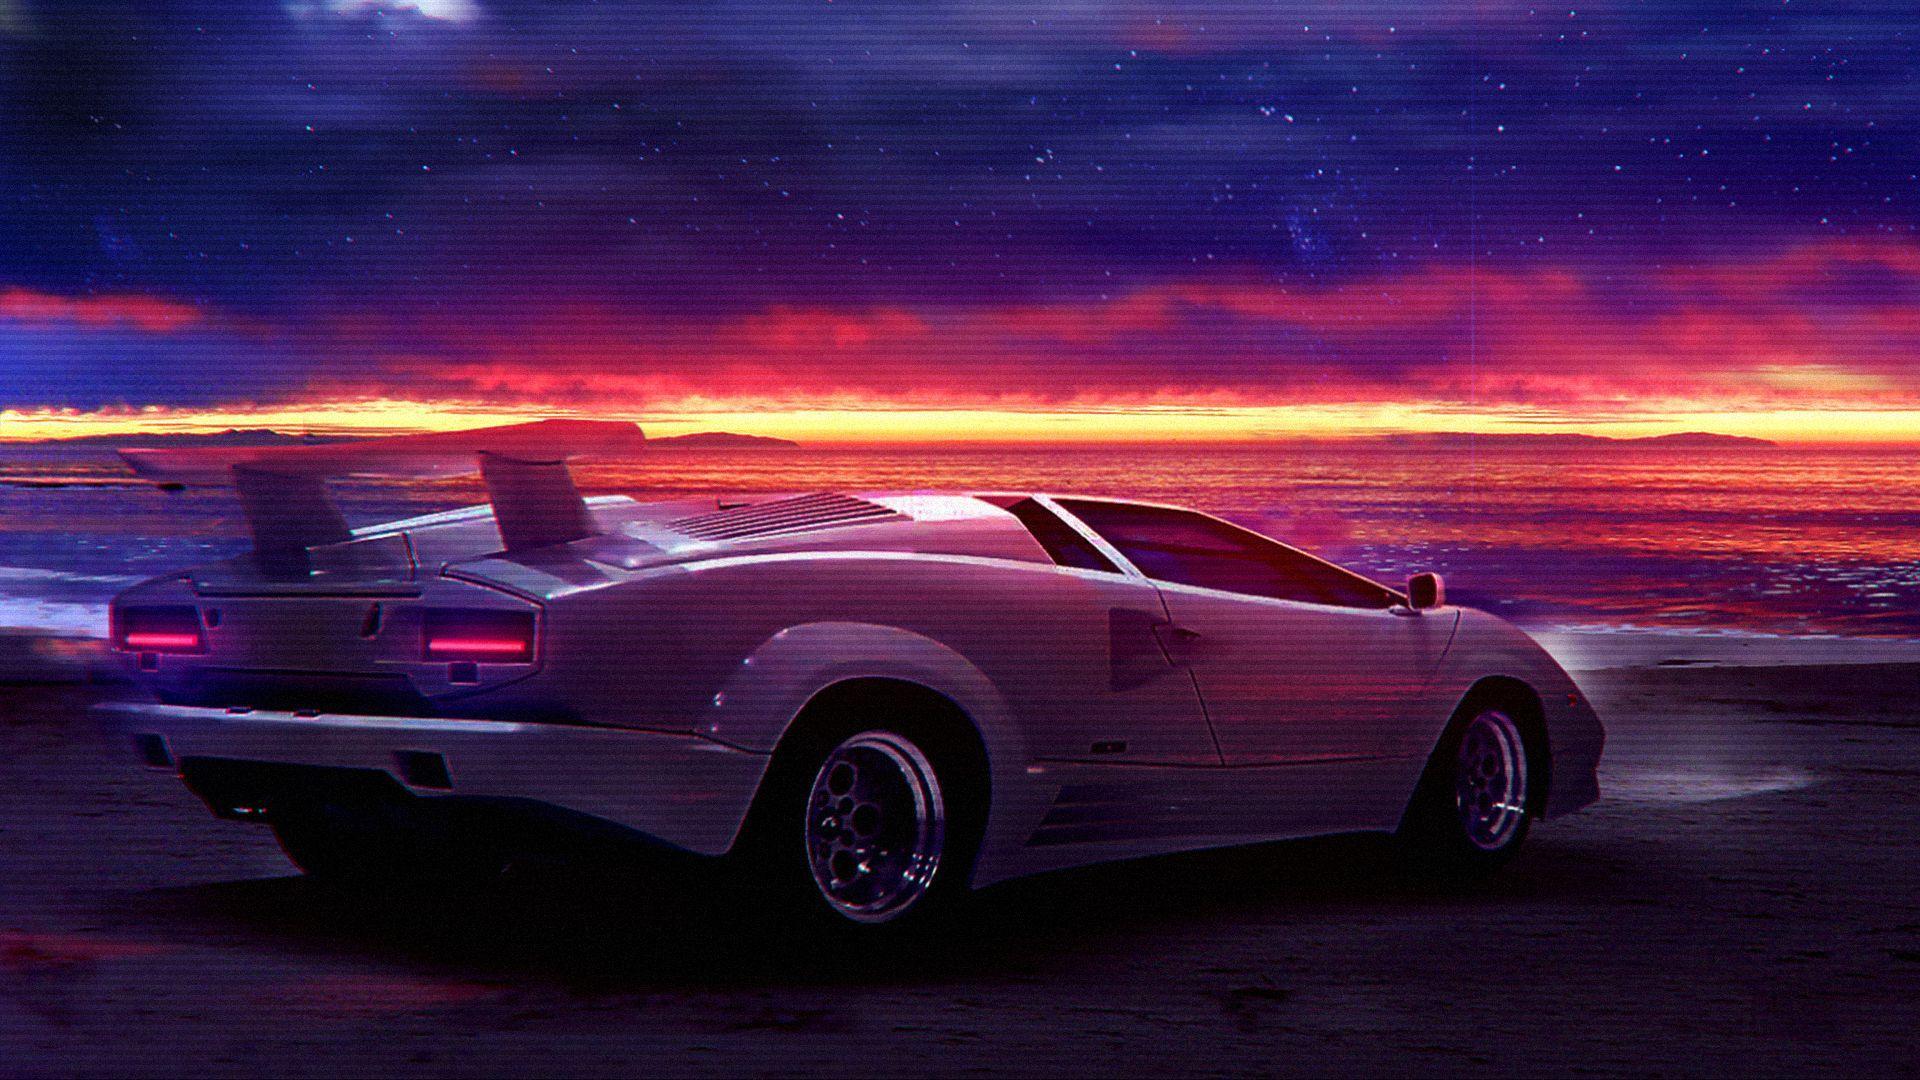 80s Retro Neon Car Wallpapers , Top Free 80s Retro Neon Car